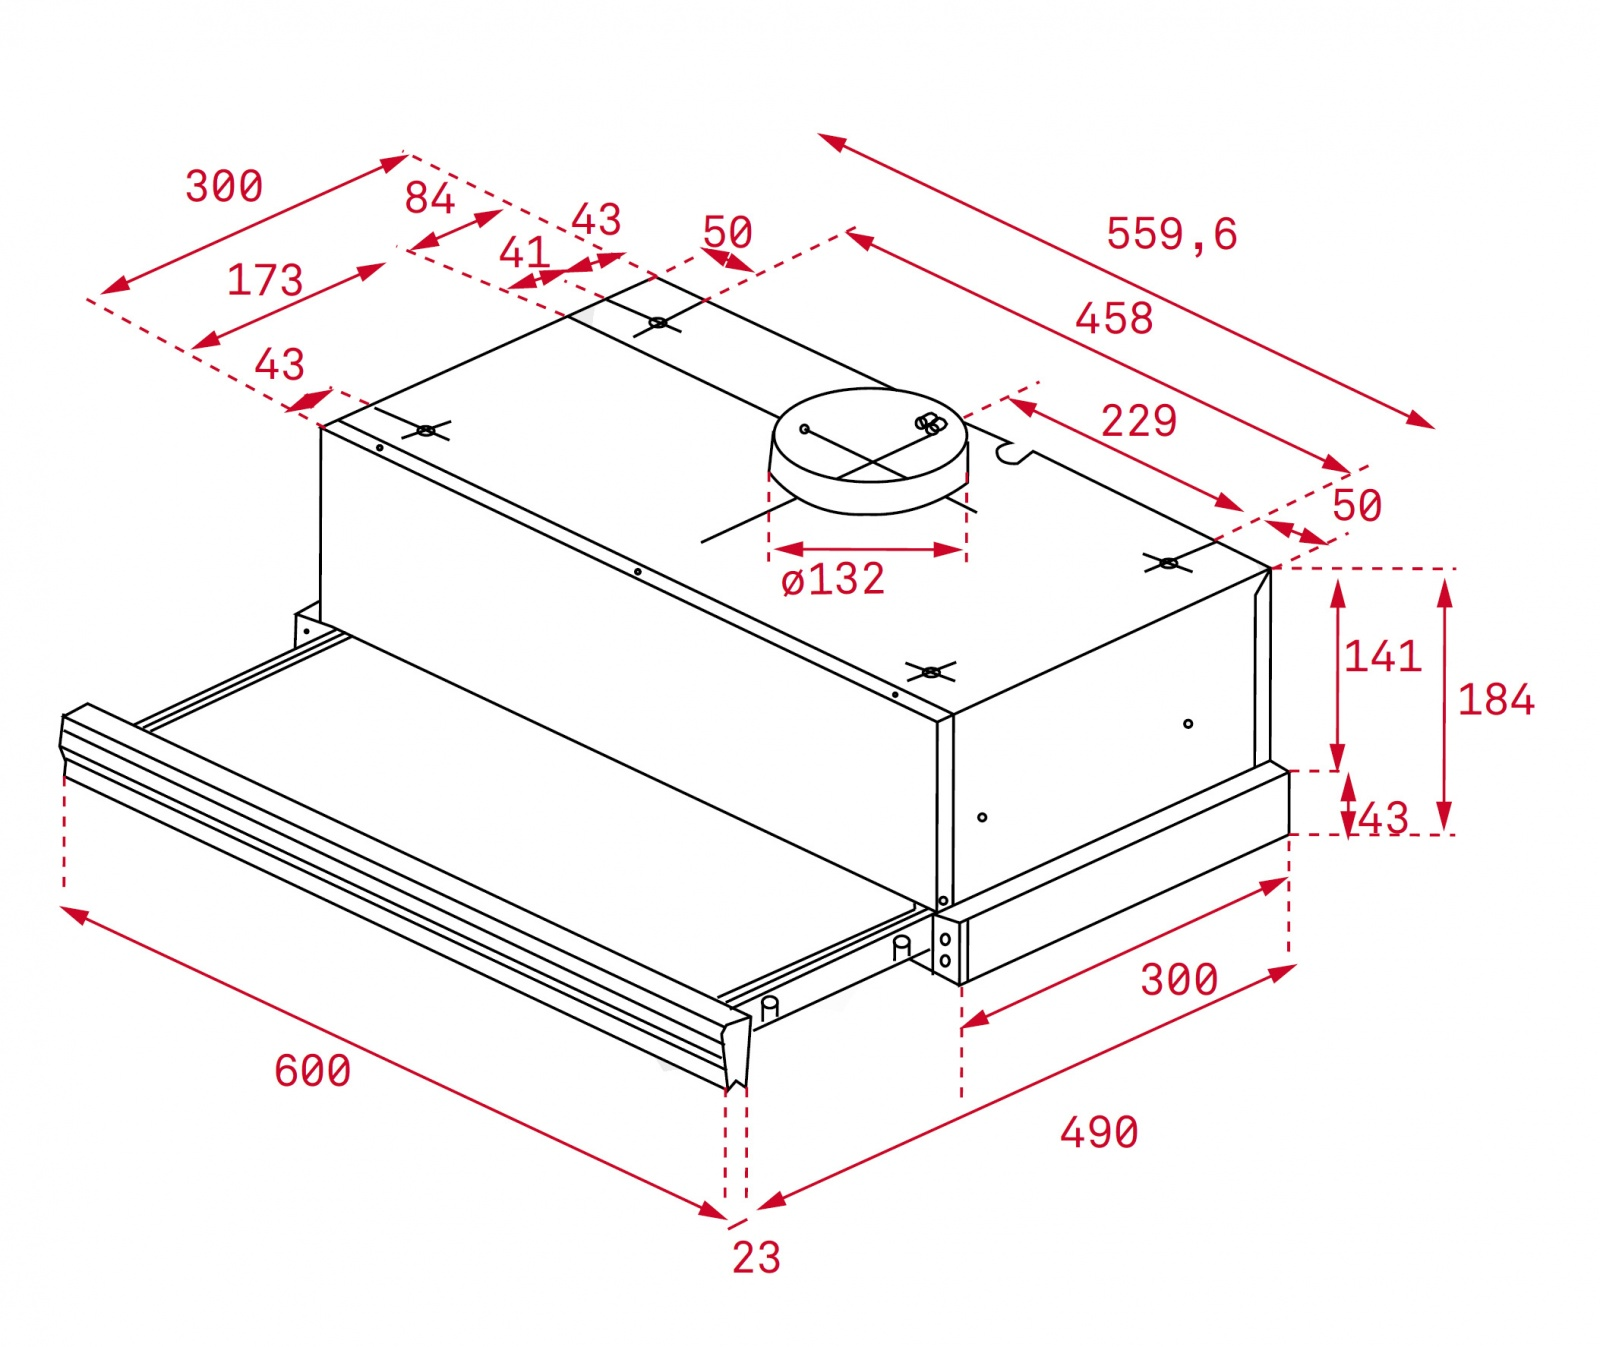 teka edelstahl einbau flachschirm dunstabzugshaube abzugshaube l fterbausten tel. Black Bedroom Furniture Sets. Home Design Ideas